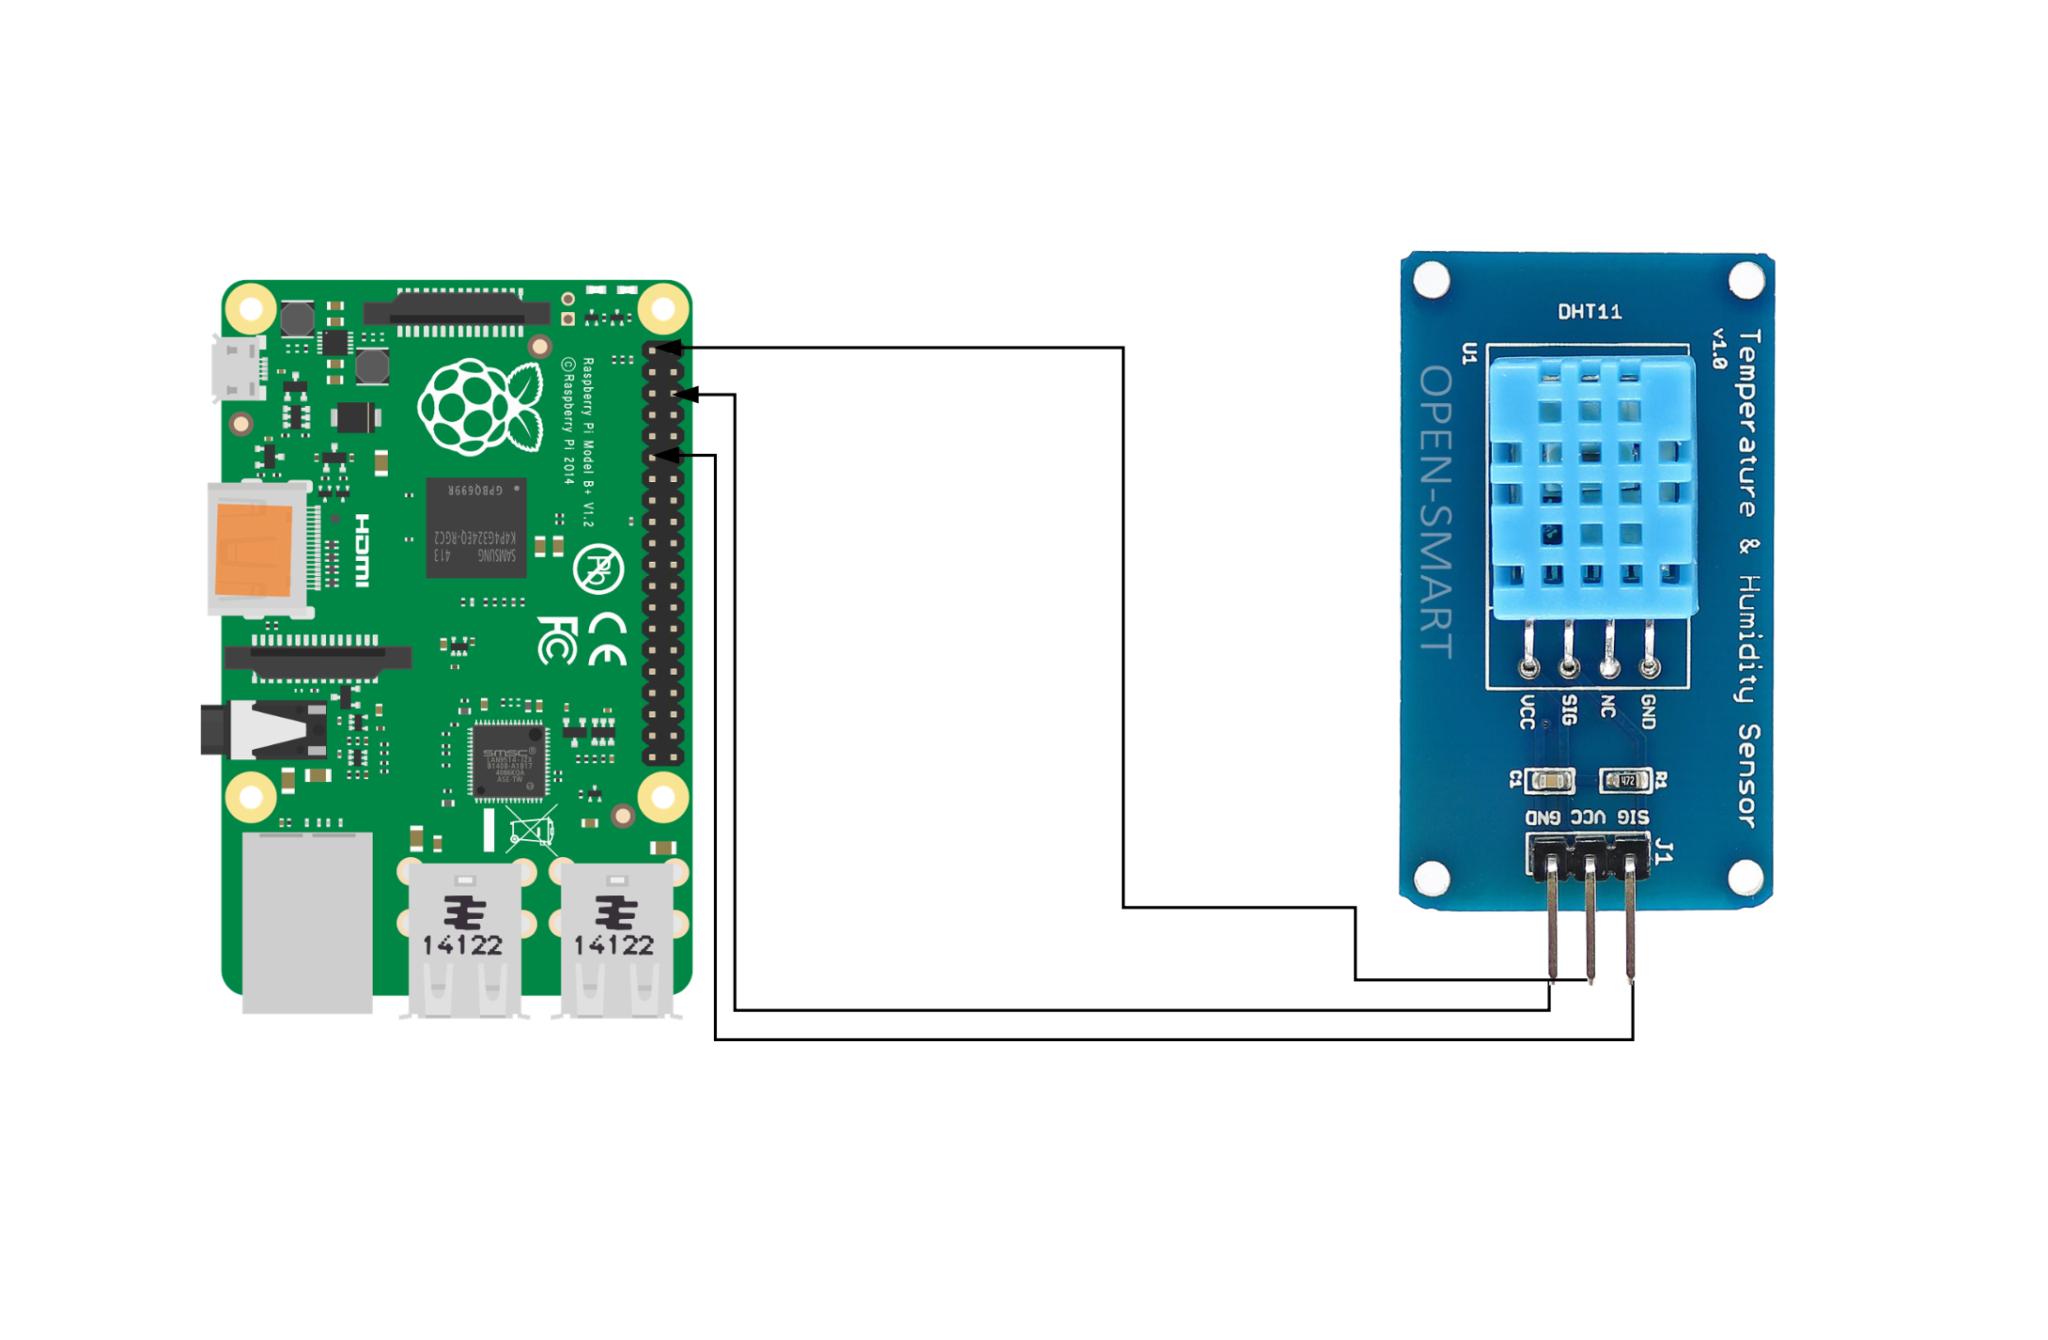 Raspberry pi 3 Model B IoT Tutorial Connecting DHT11